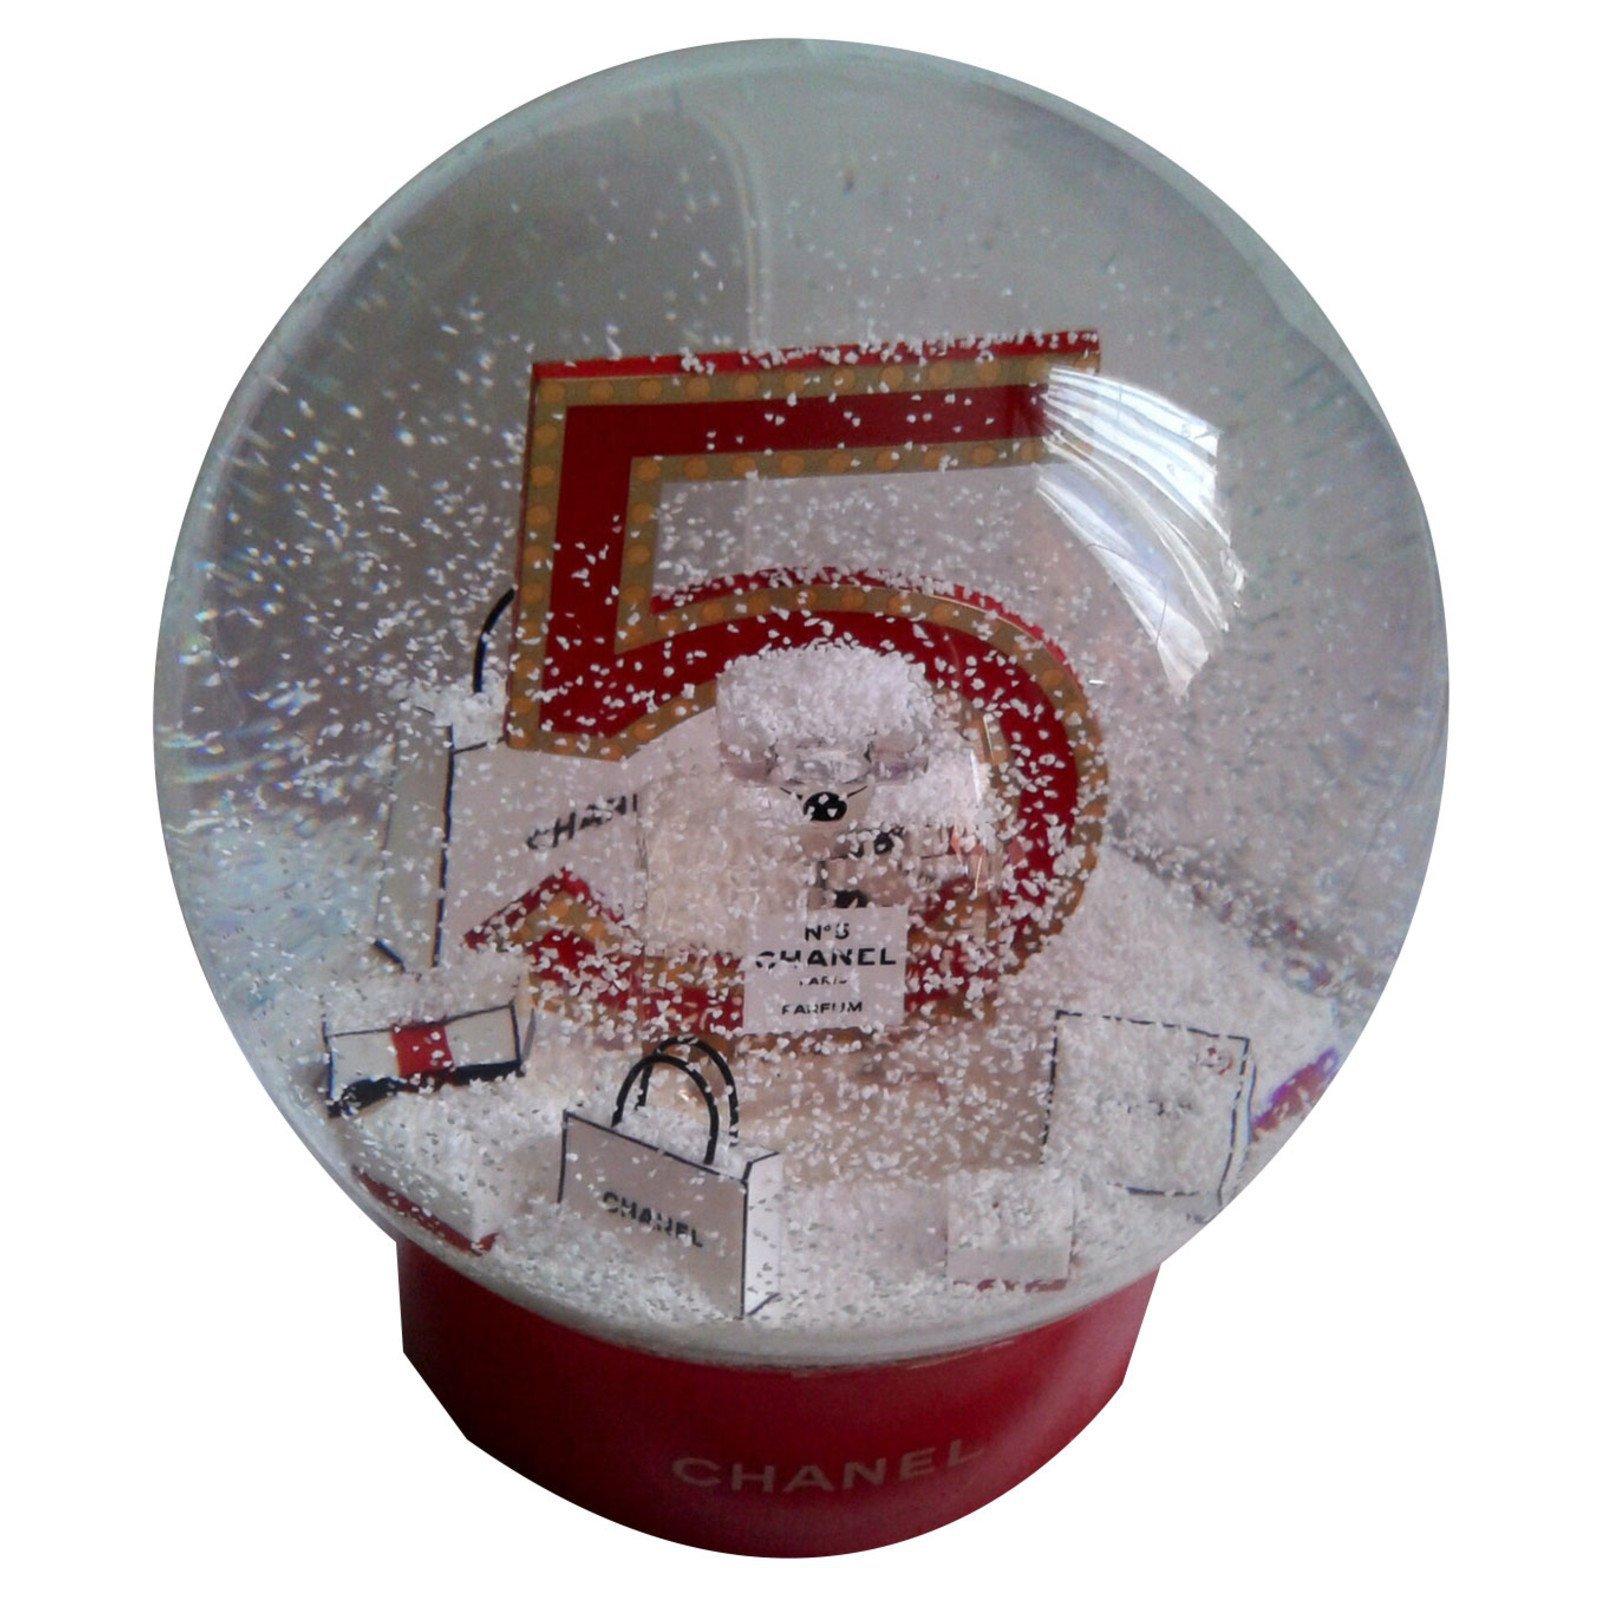 cadeaux vip chanel boule neige 5 verre rouge. Black Bedroom Furniture Sets. Home Design Ideas